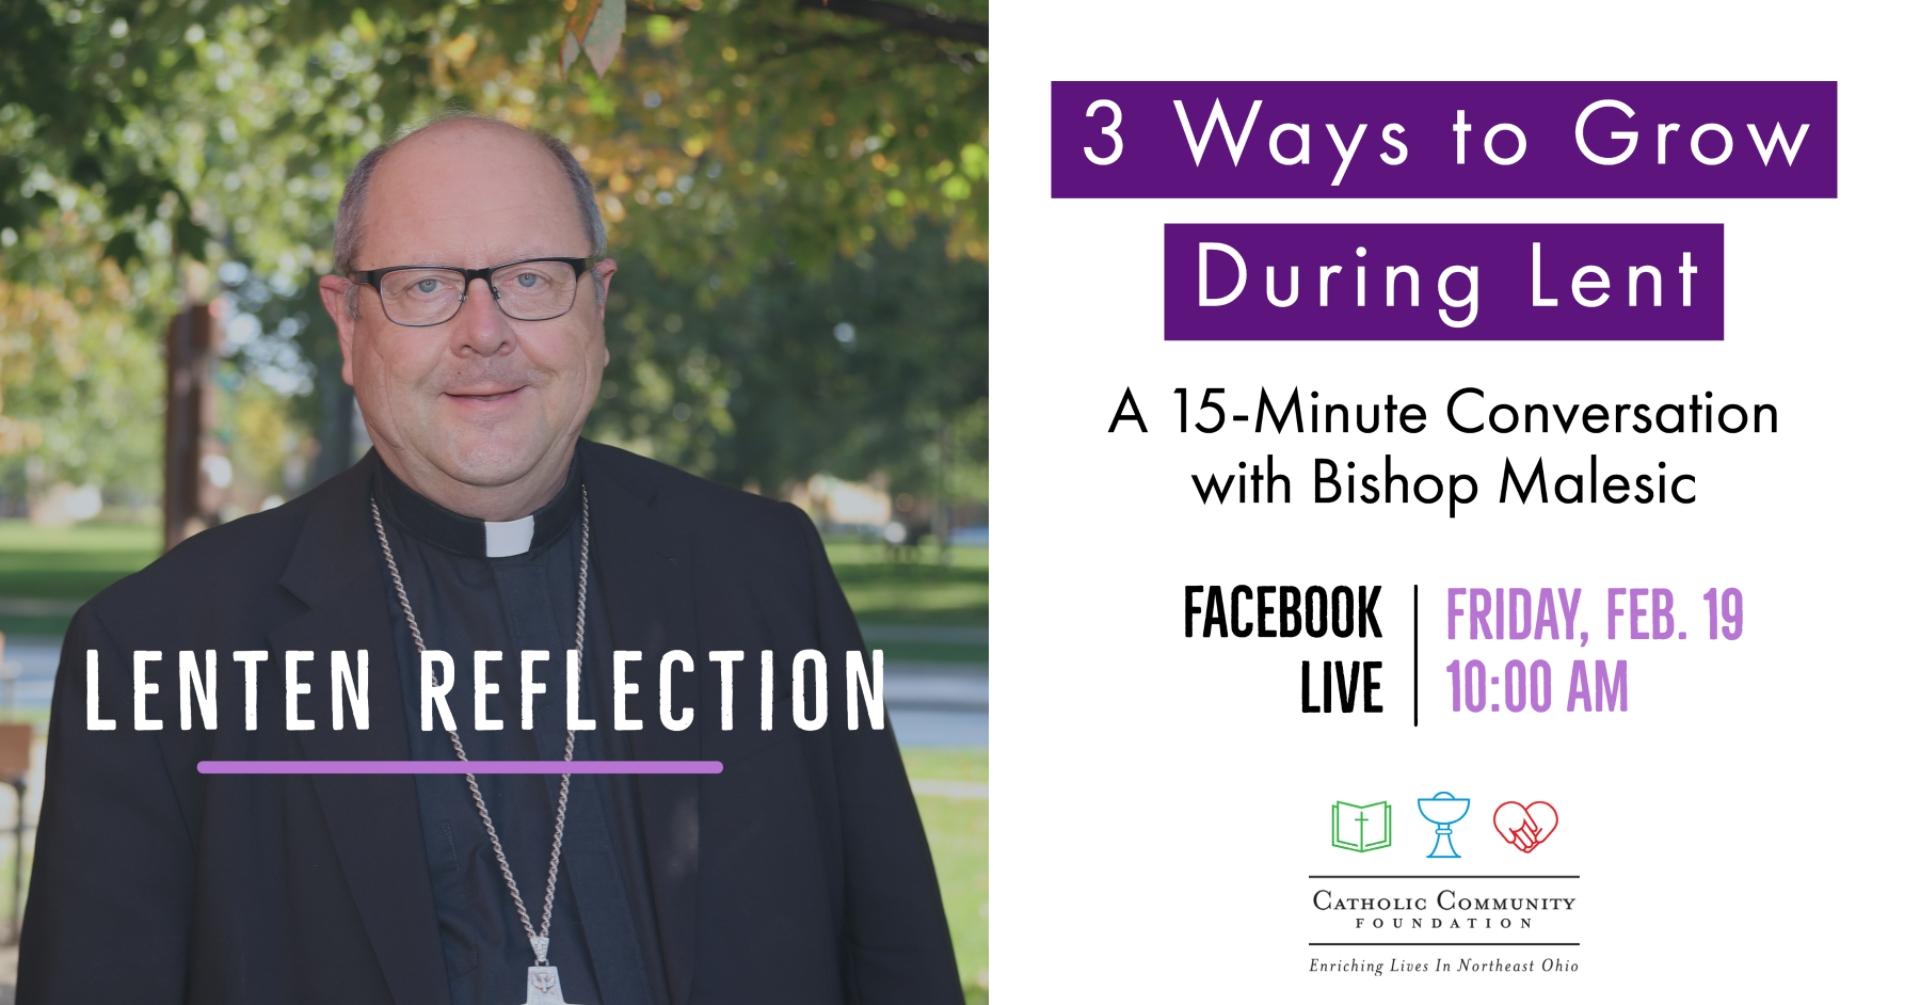 Lenten Reflection - 3 Ways to Grow During Lent